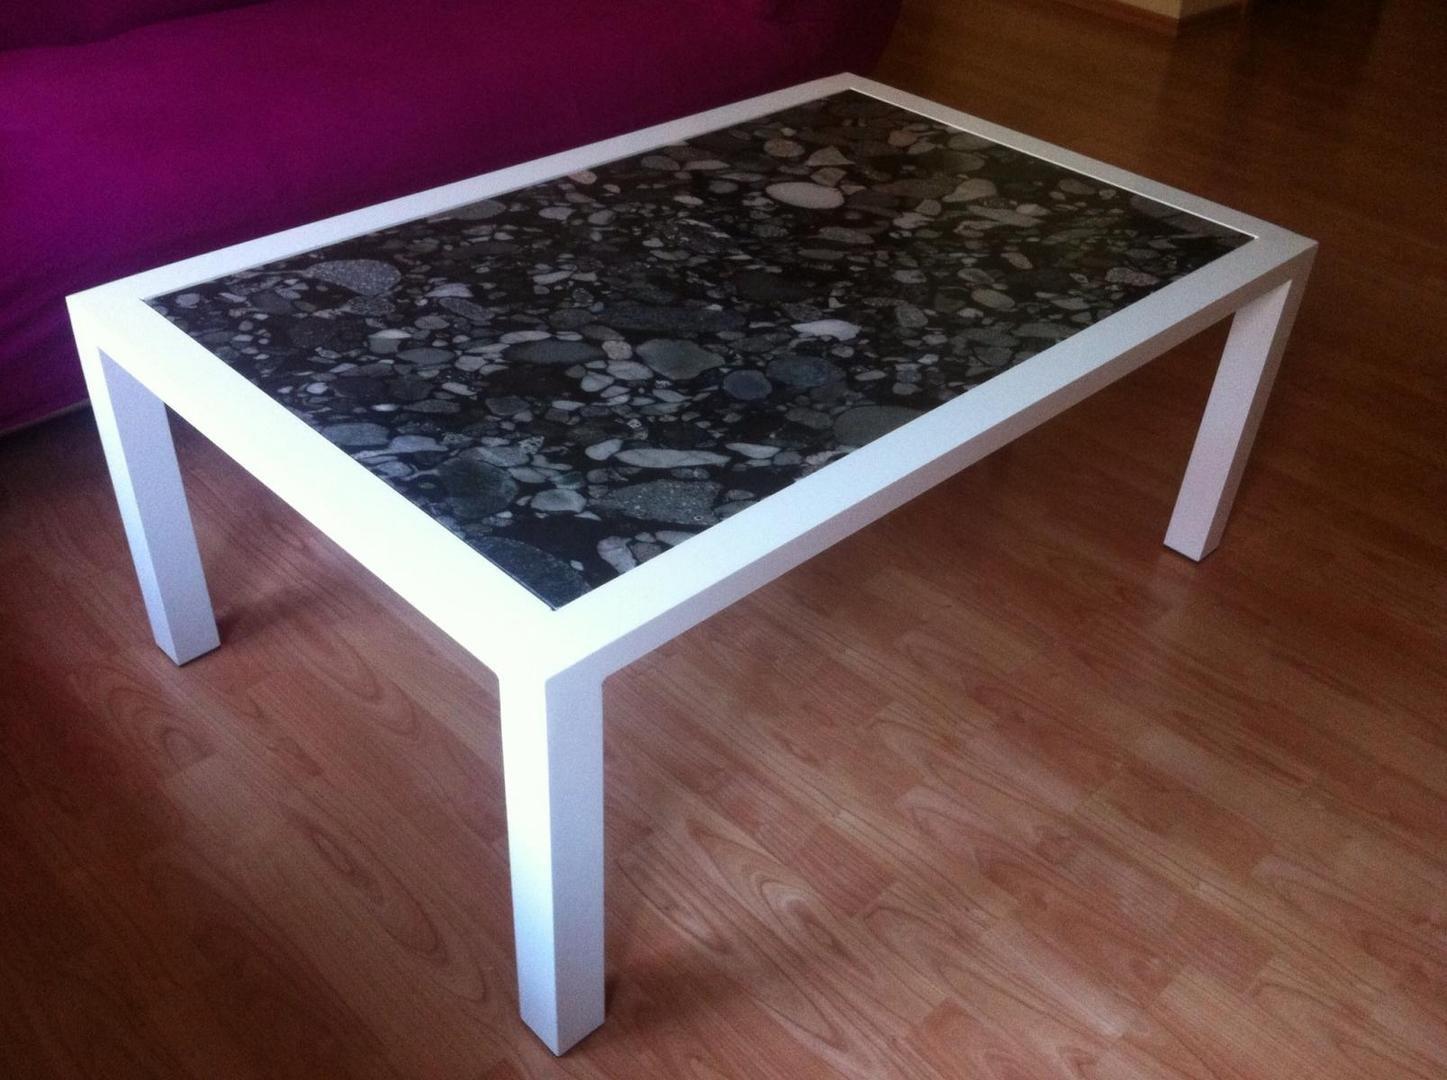 marktplatz mittelstand. Black Bedroom Furniture Sets. Home Design Ideas